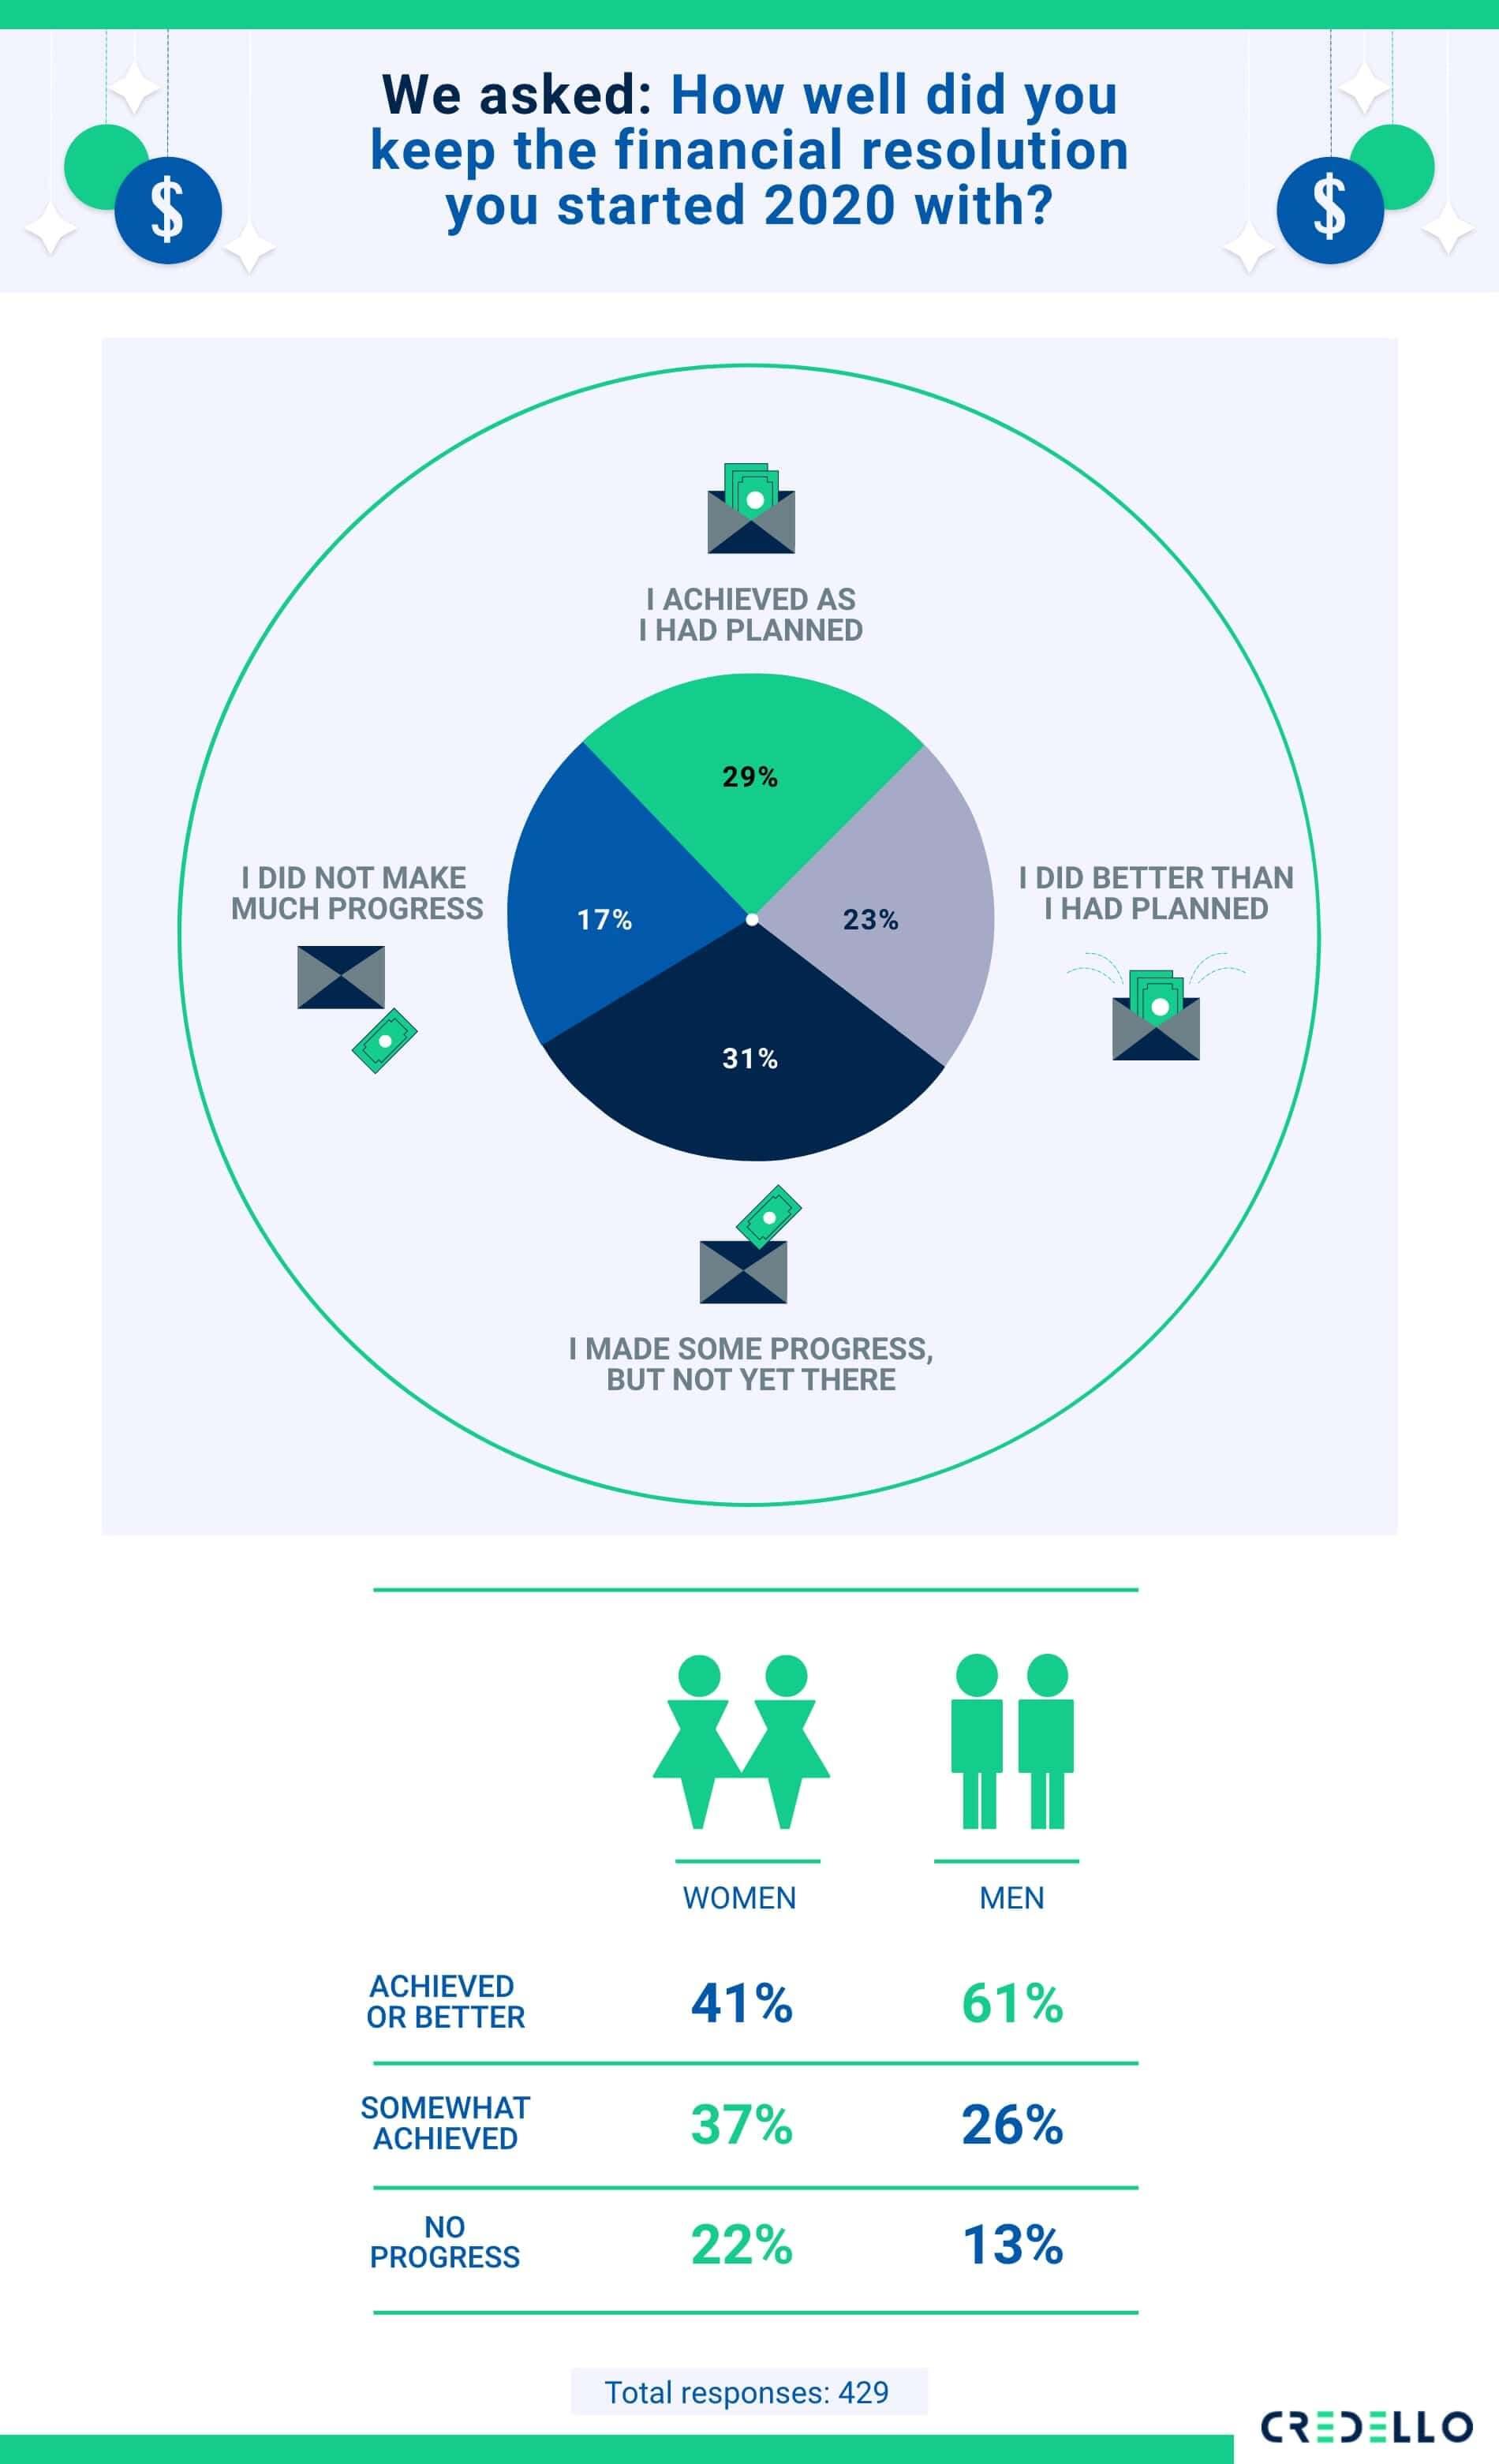 millennials status on their 2020 financial resolutions